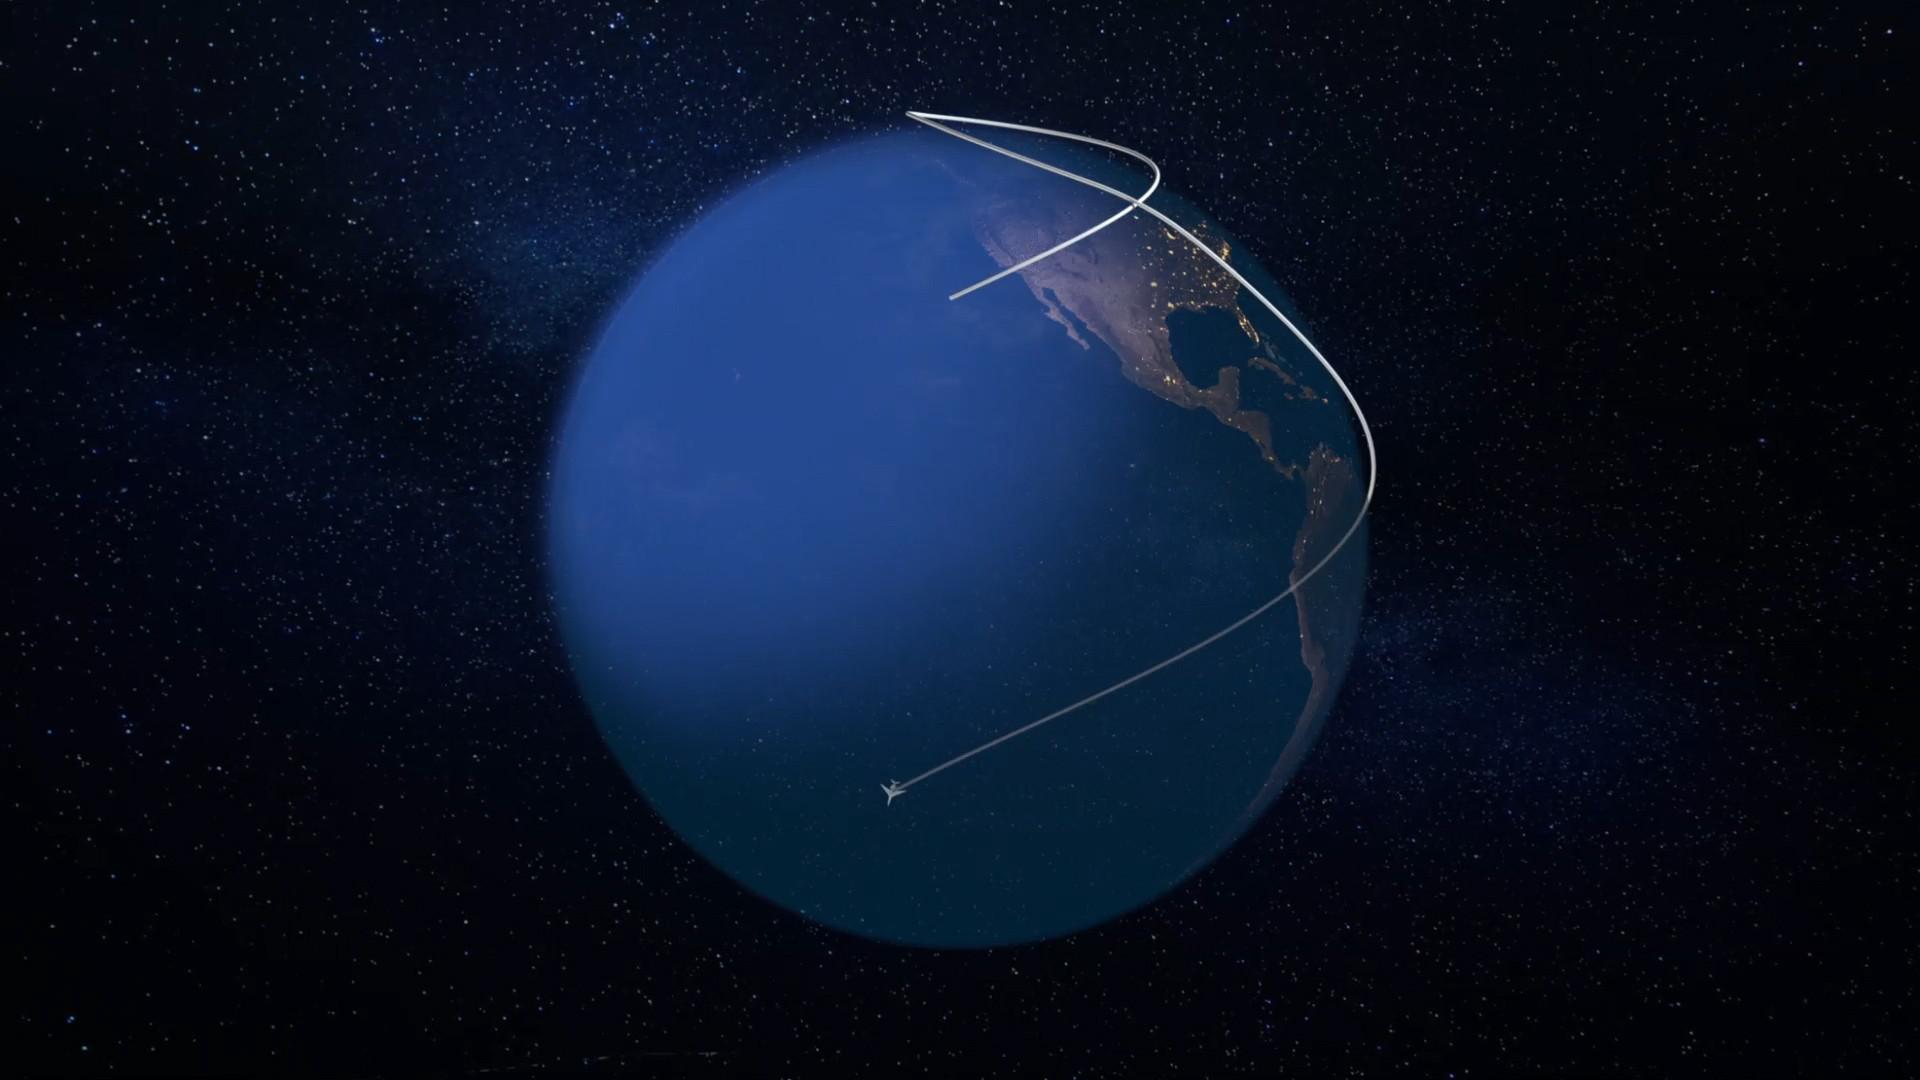 03. One More Orbit Flight Path